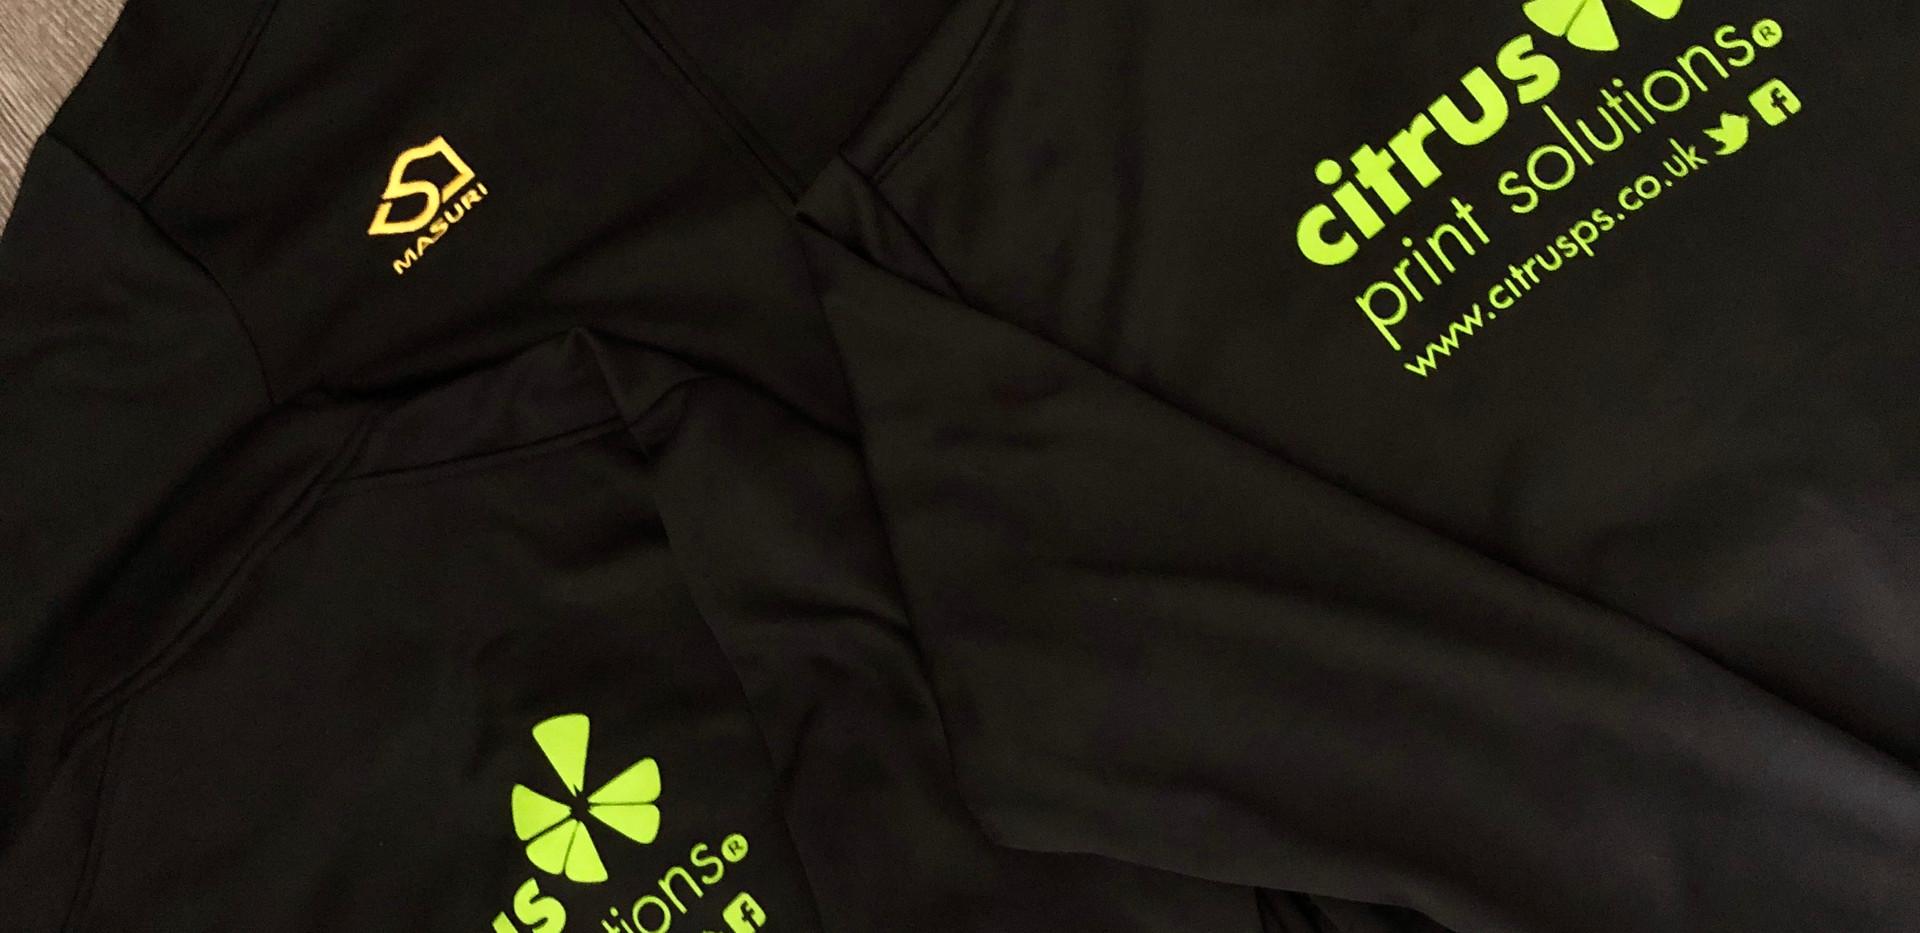 Club Zip ups from Citrus